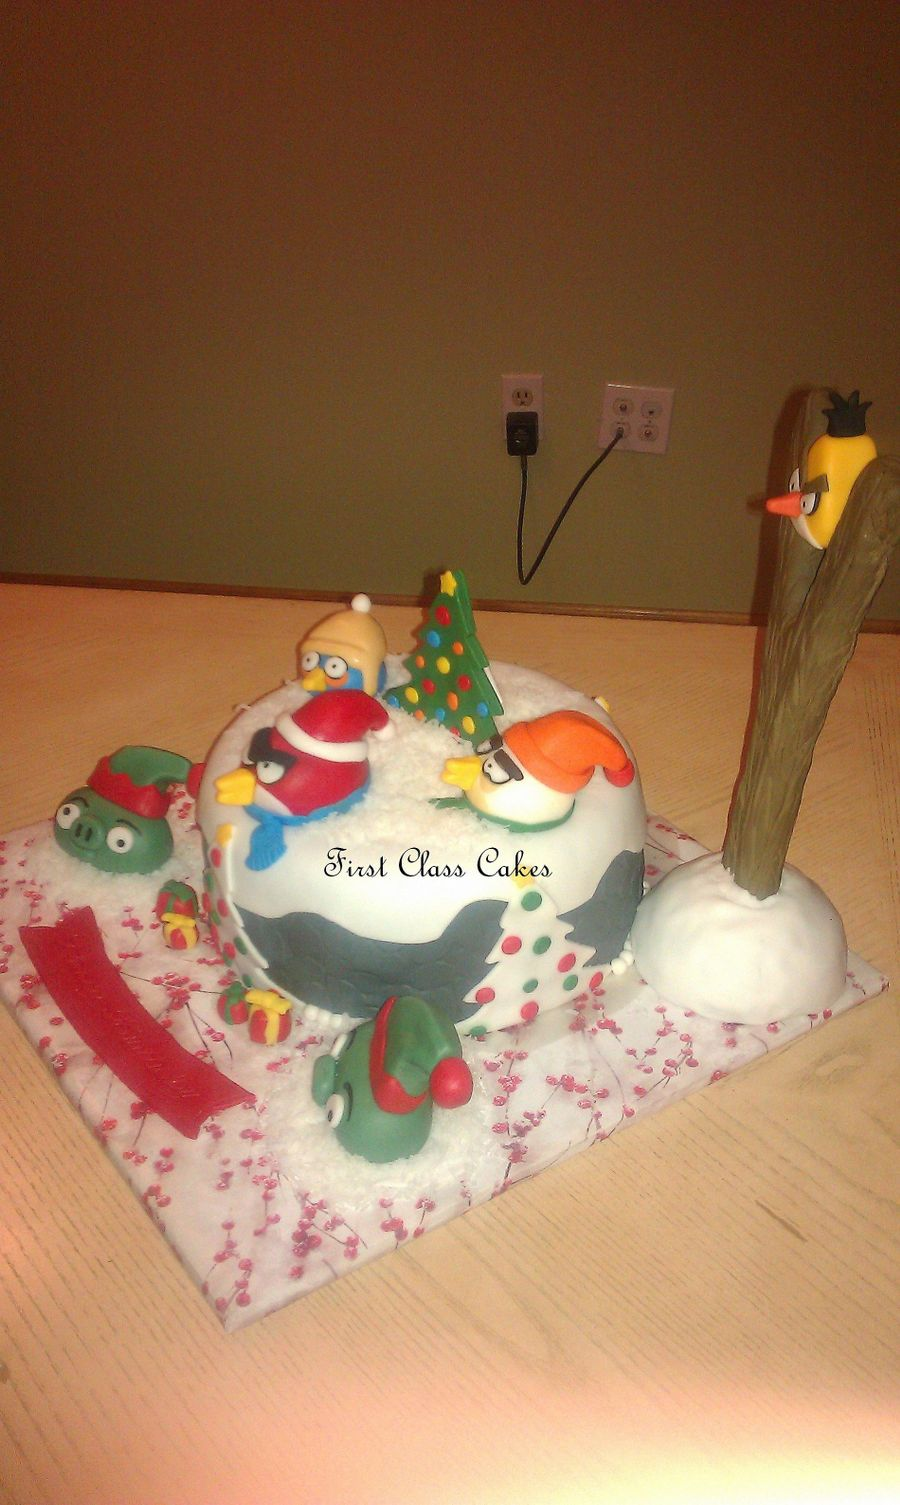 Most Explosive Birthday Cake